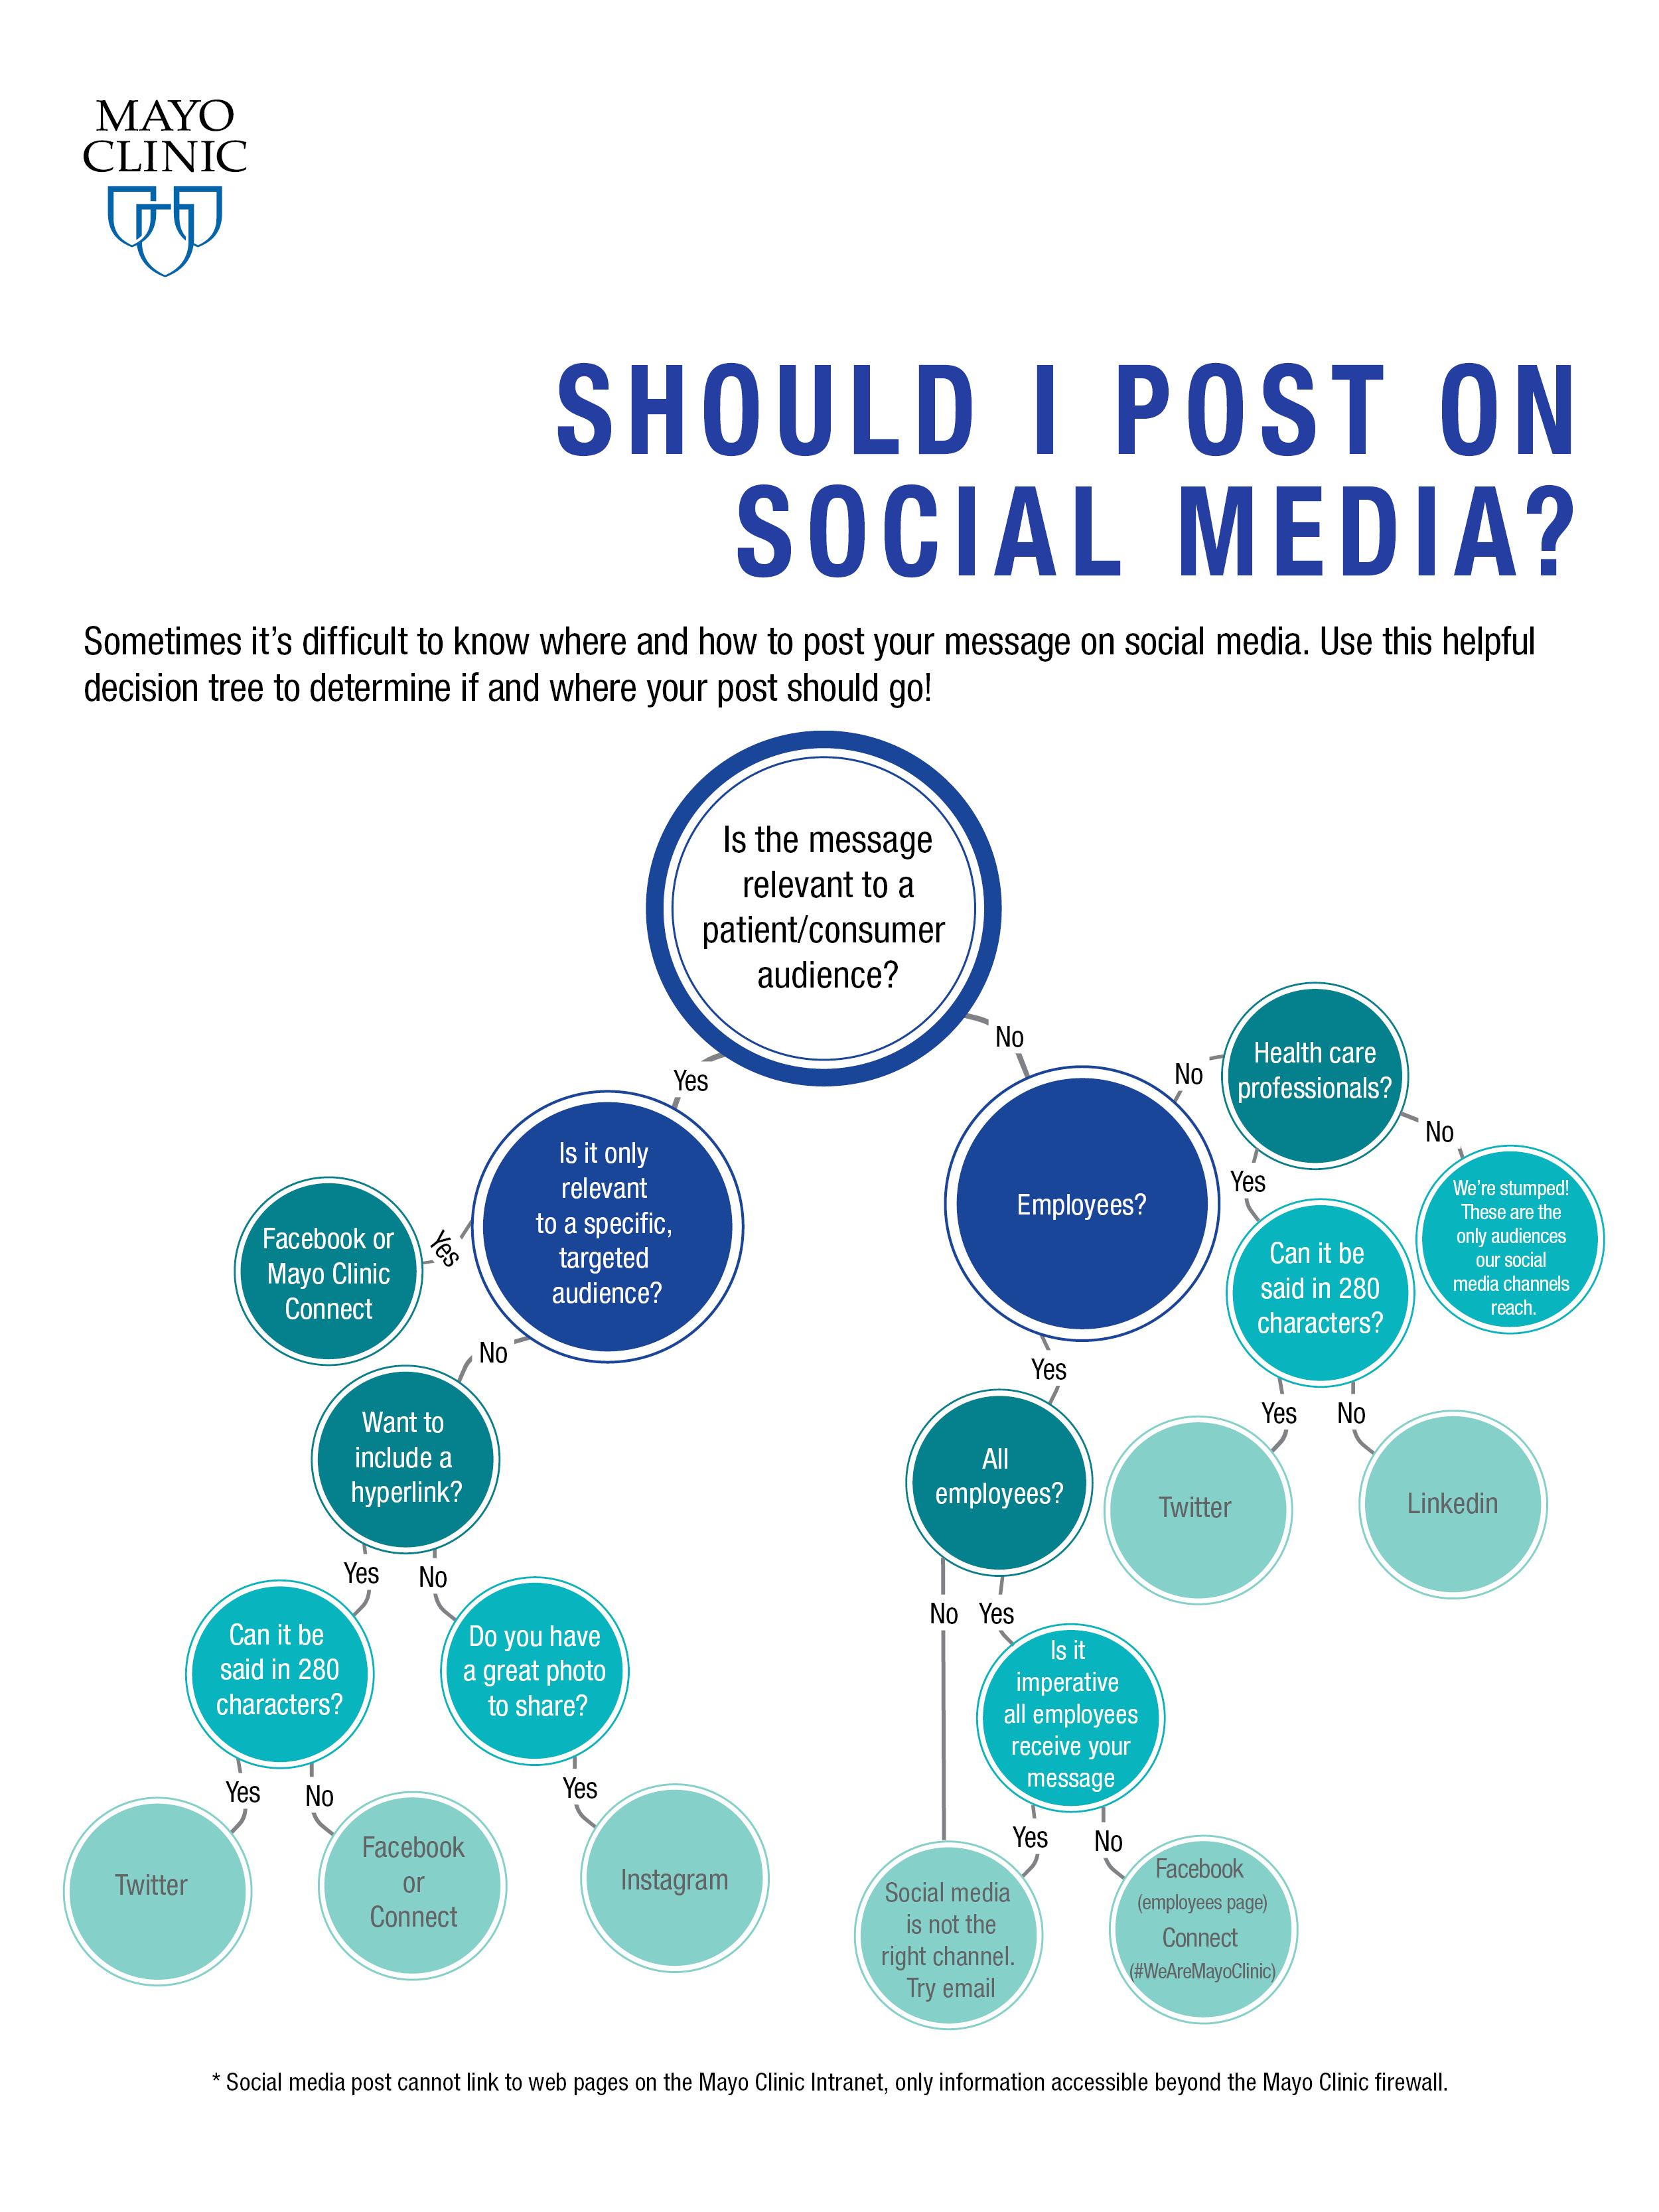 Should I Post on Social Media? | Decision Tree